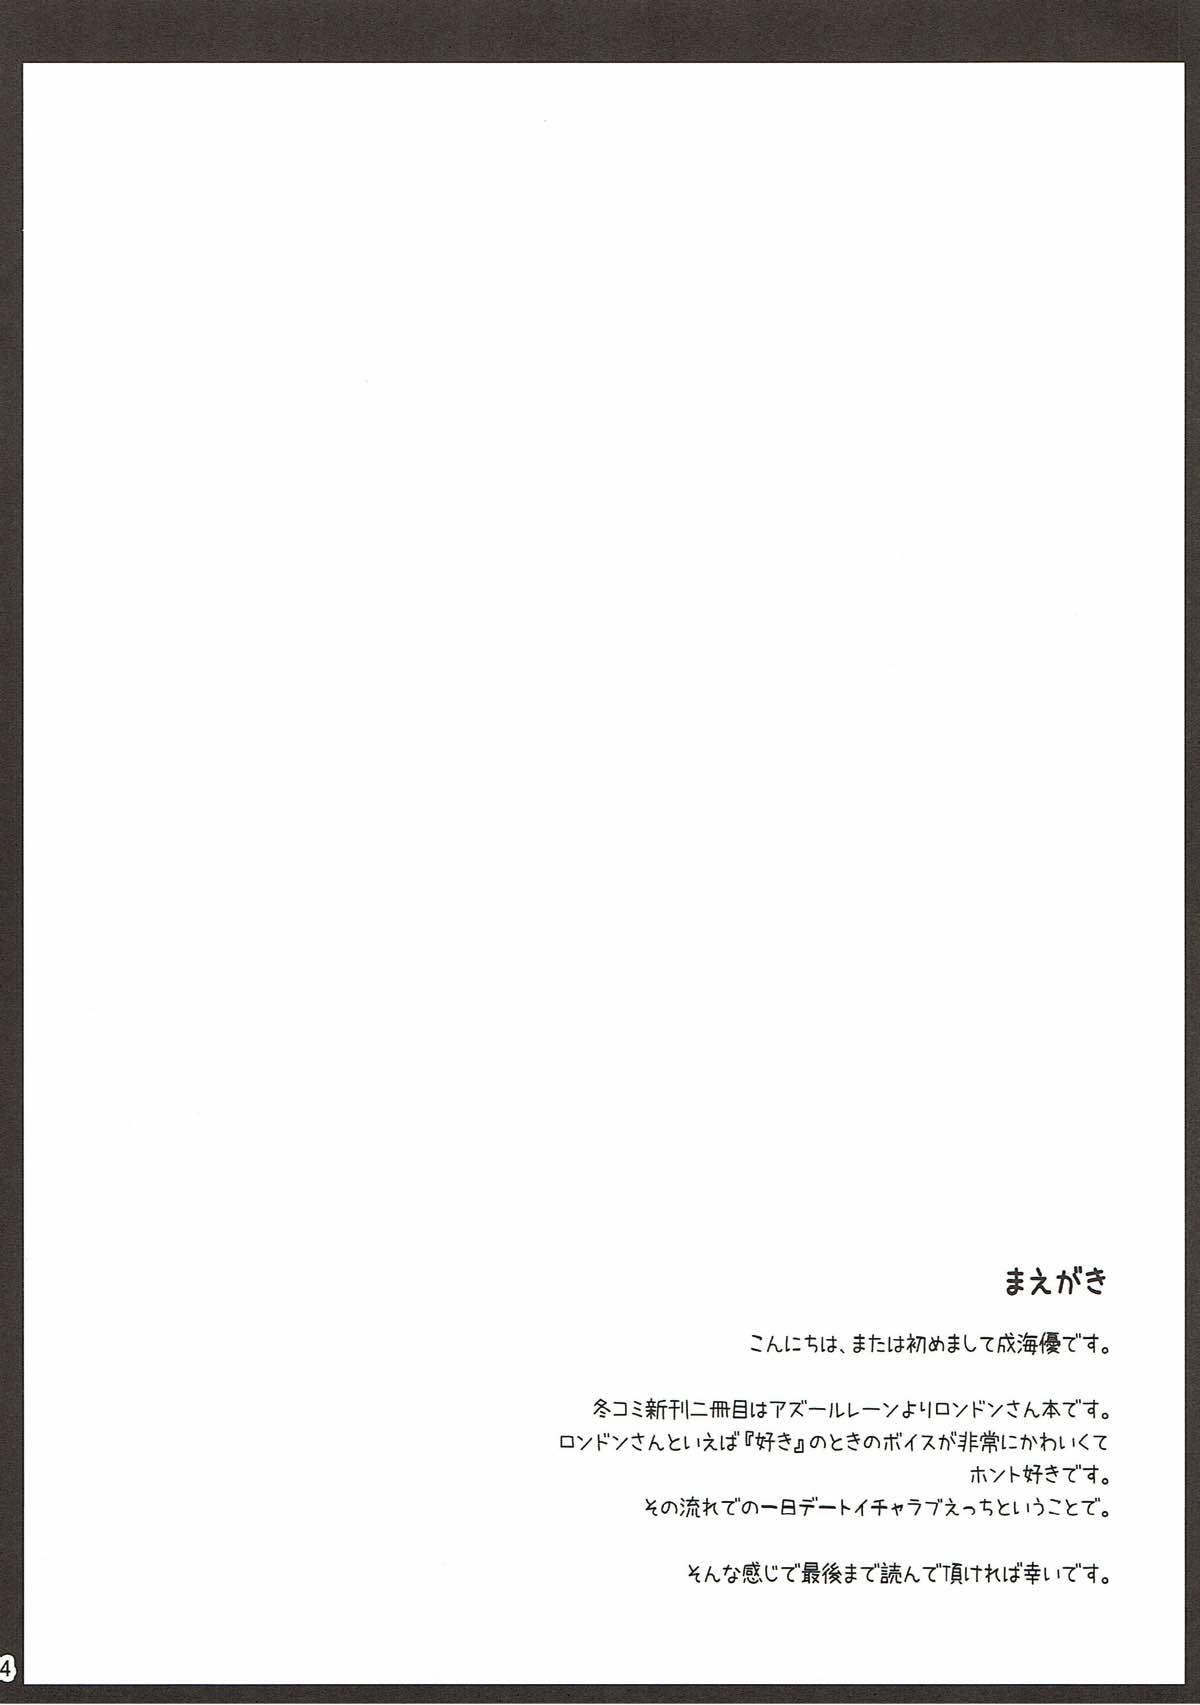 (C93) [Imitation Moon (Narumi Yuu)] London-san to Ichinichi Date | One day date with London-san (Azur Lane) [English] [LunaticSeibah] 2